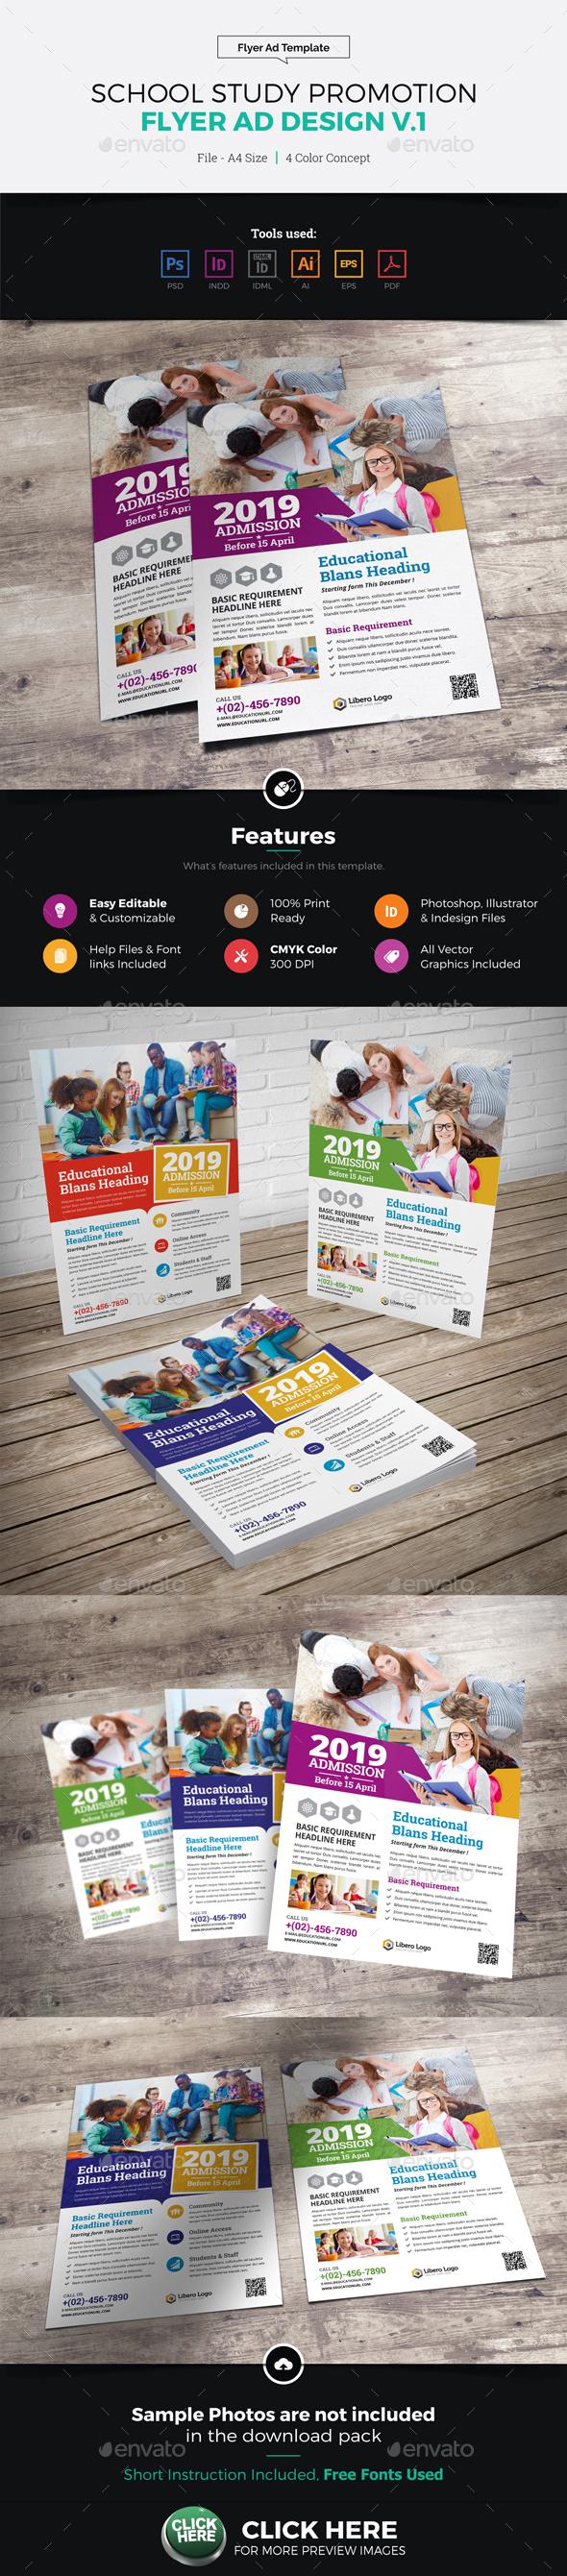 School Study Promotion Flyer Ad v1 - Corporate Flyers